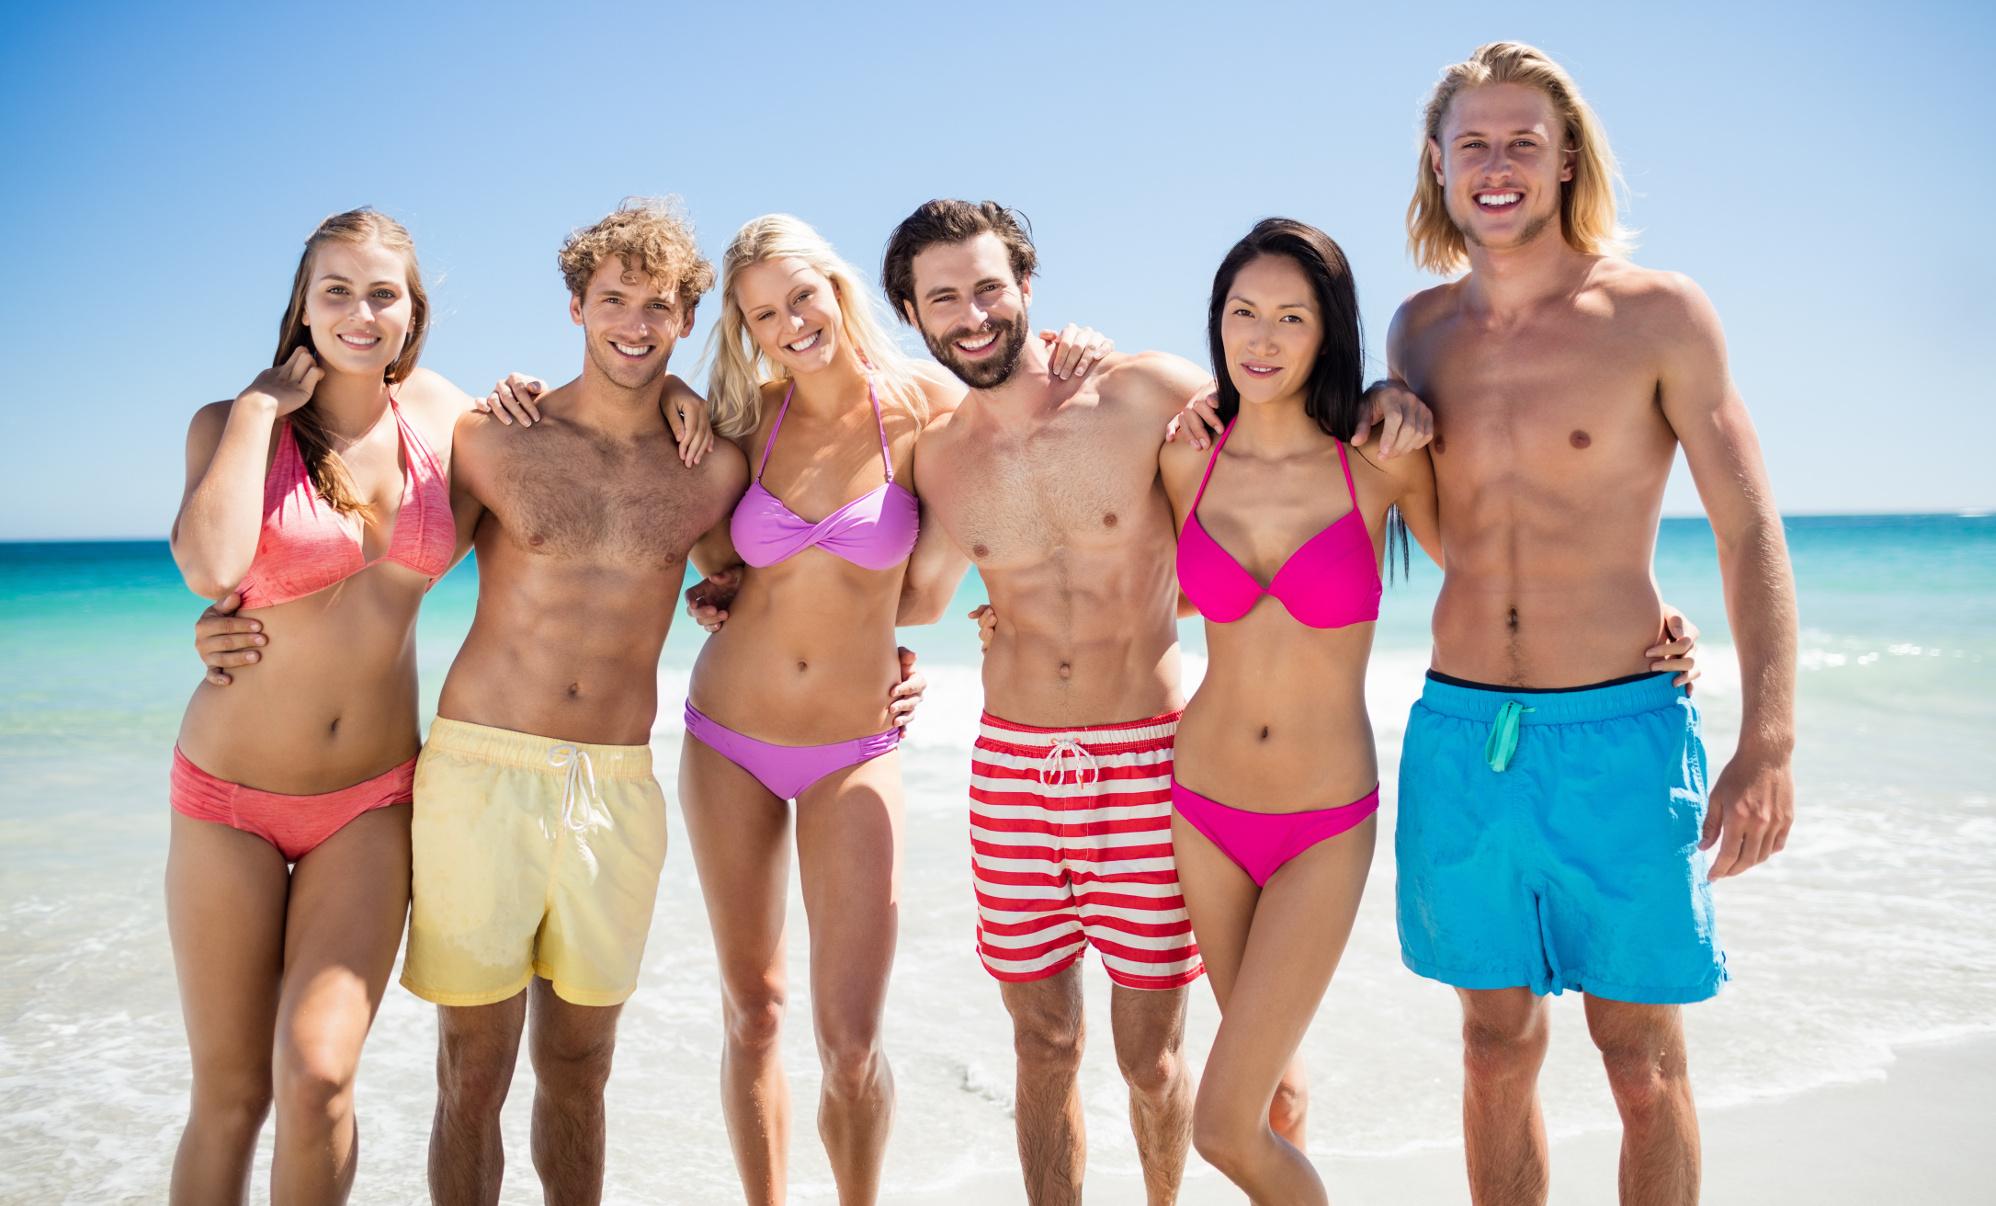 ed81bc3e29f8 Bikinis y bañadores más de moda de este verano 2017